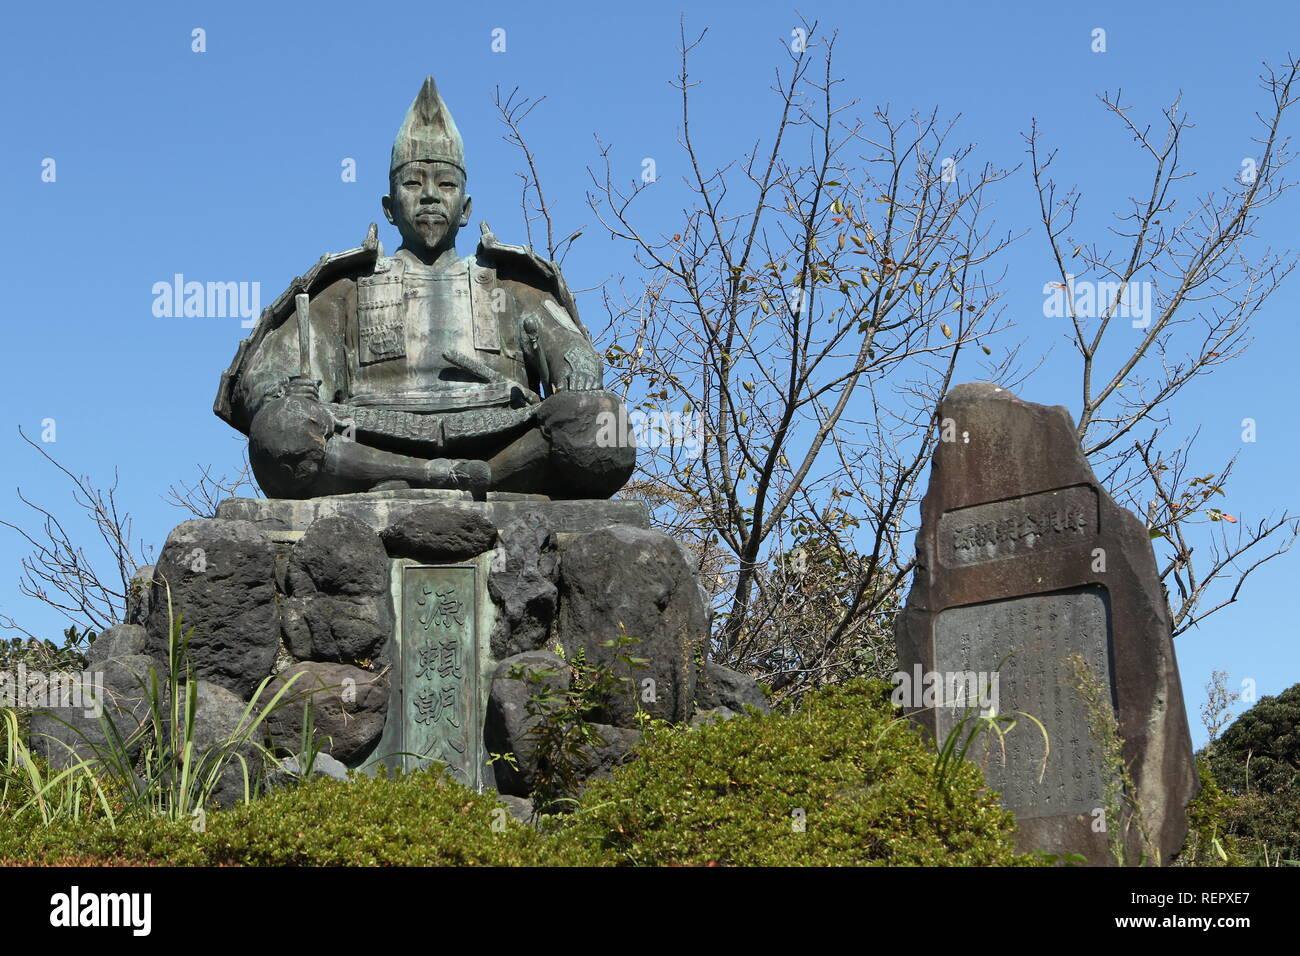 Statue of Minamoto no Yoritomo at Genjiyama Park, Kamakura, Kanagawa Prefecture, Japan - Stock Image